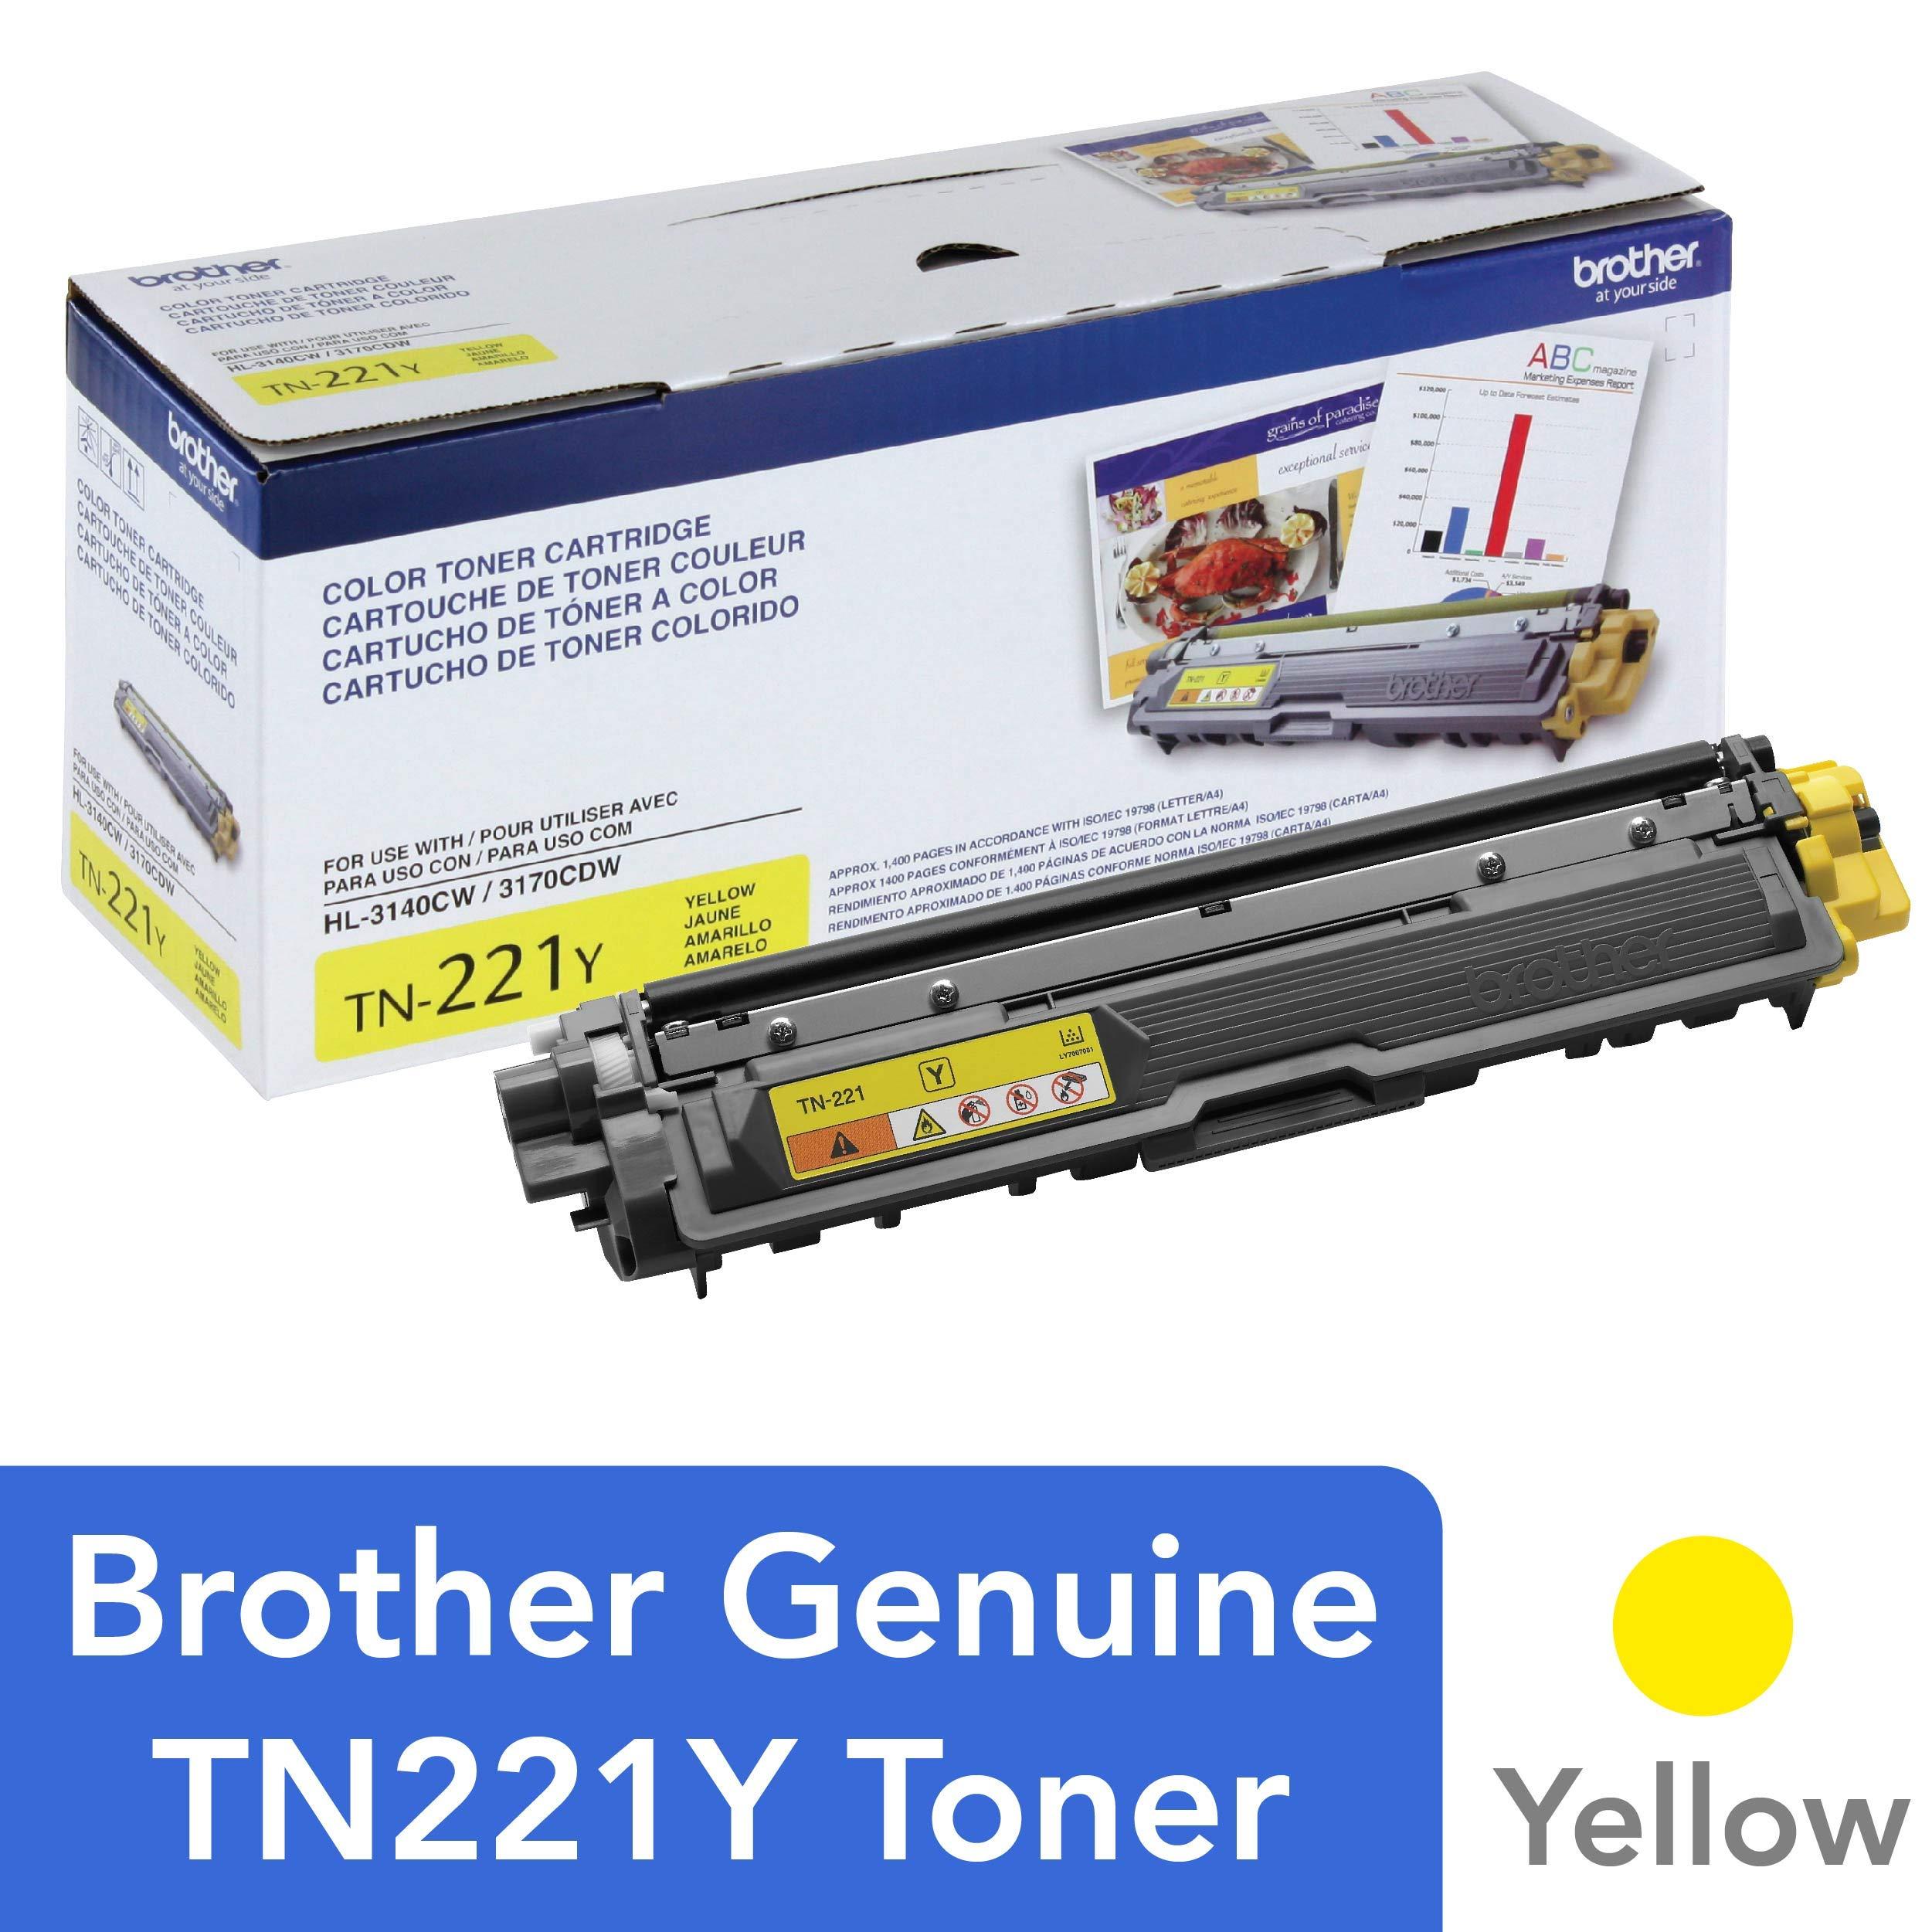 GENUINE OEM BROTHER TN210Y YELLOW TONER CARTRIDGE